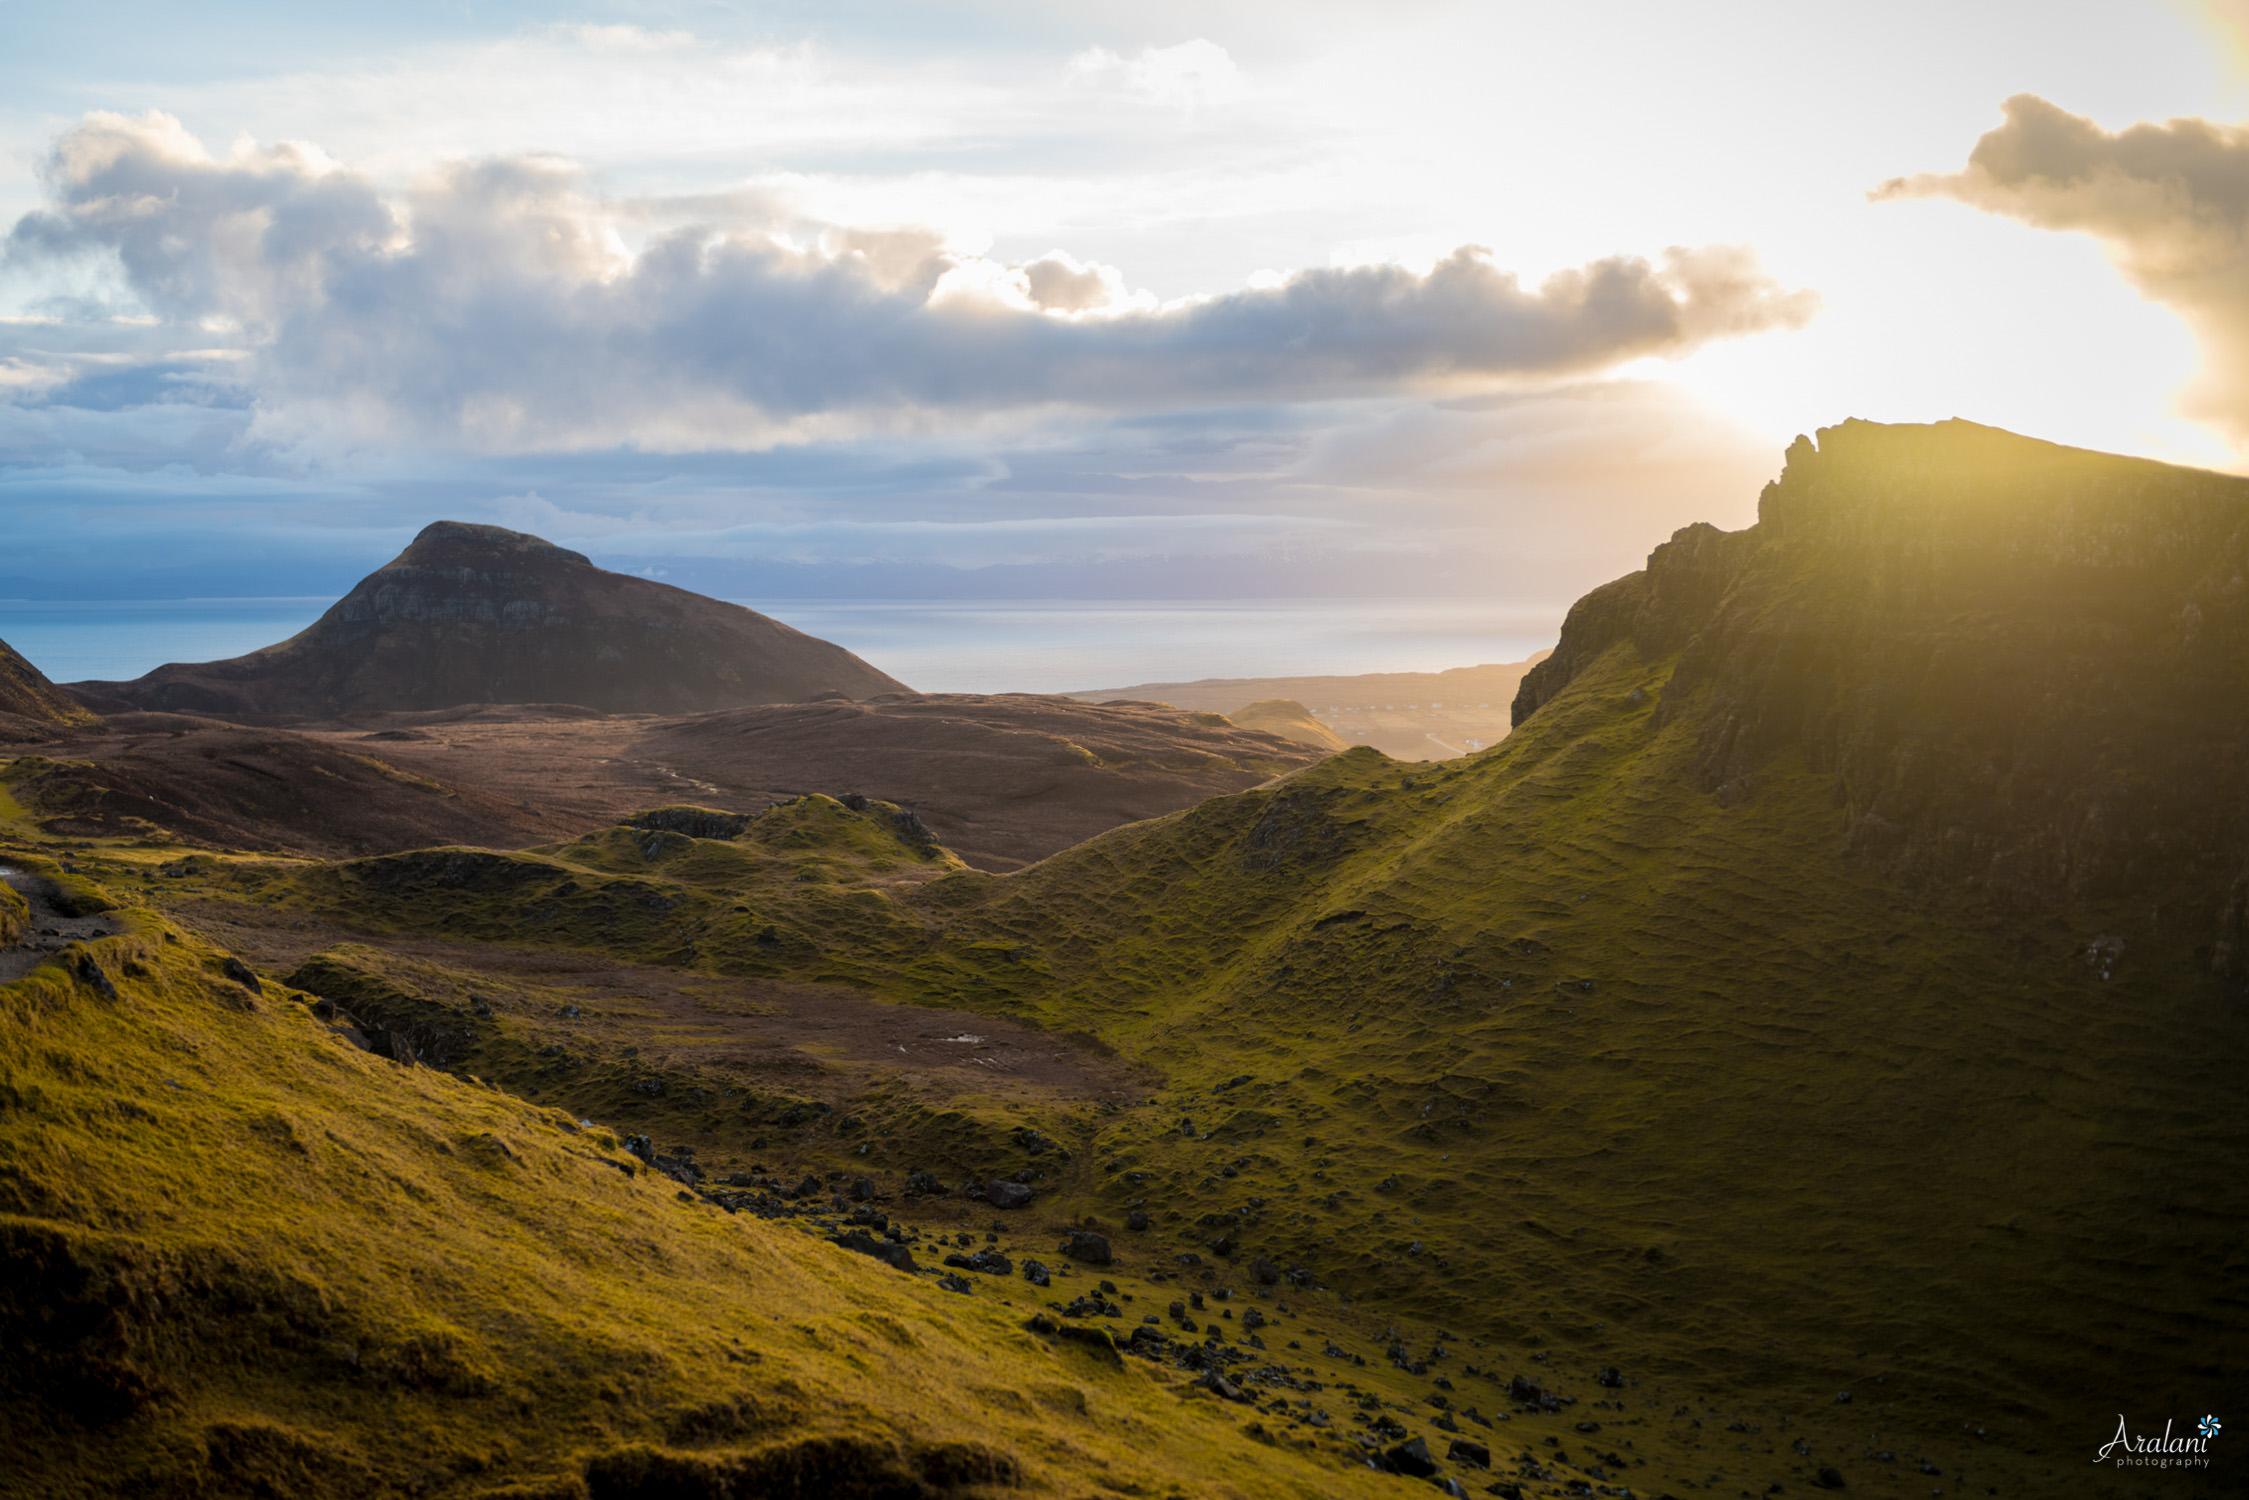 Aralani_Scotland_0018.jpg